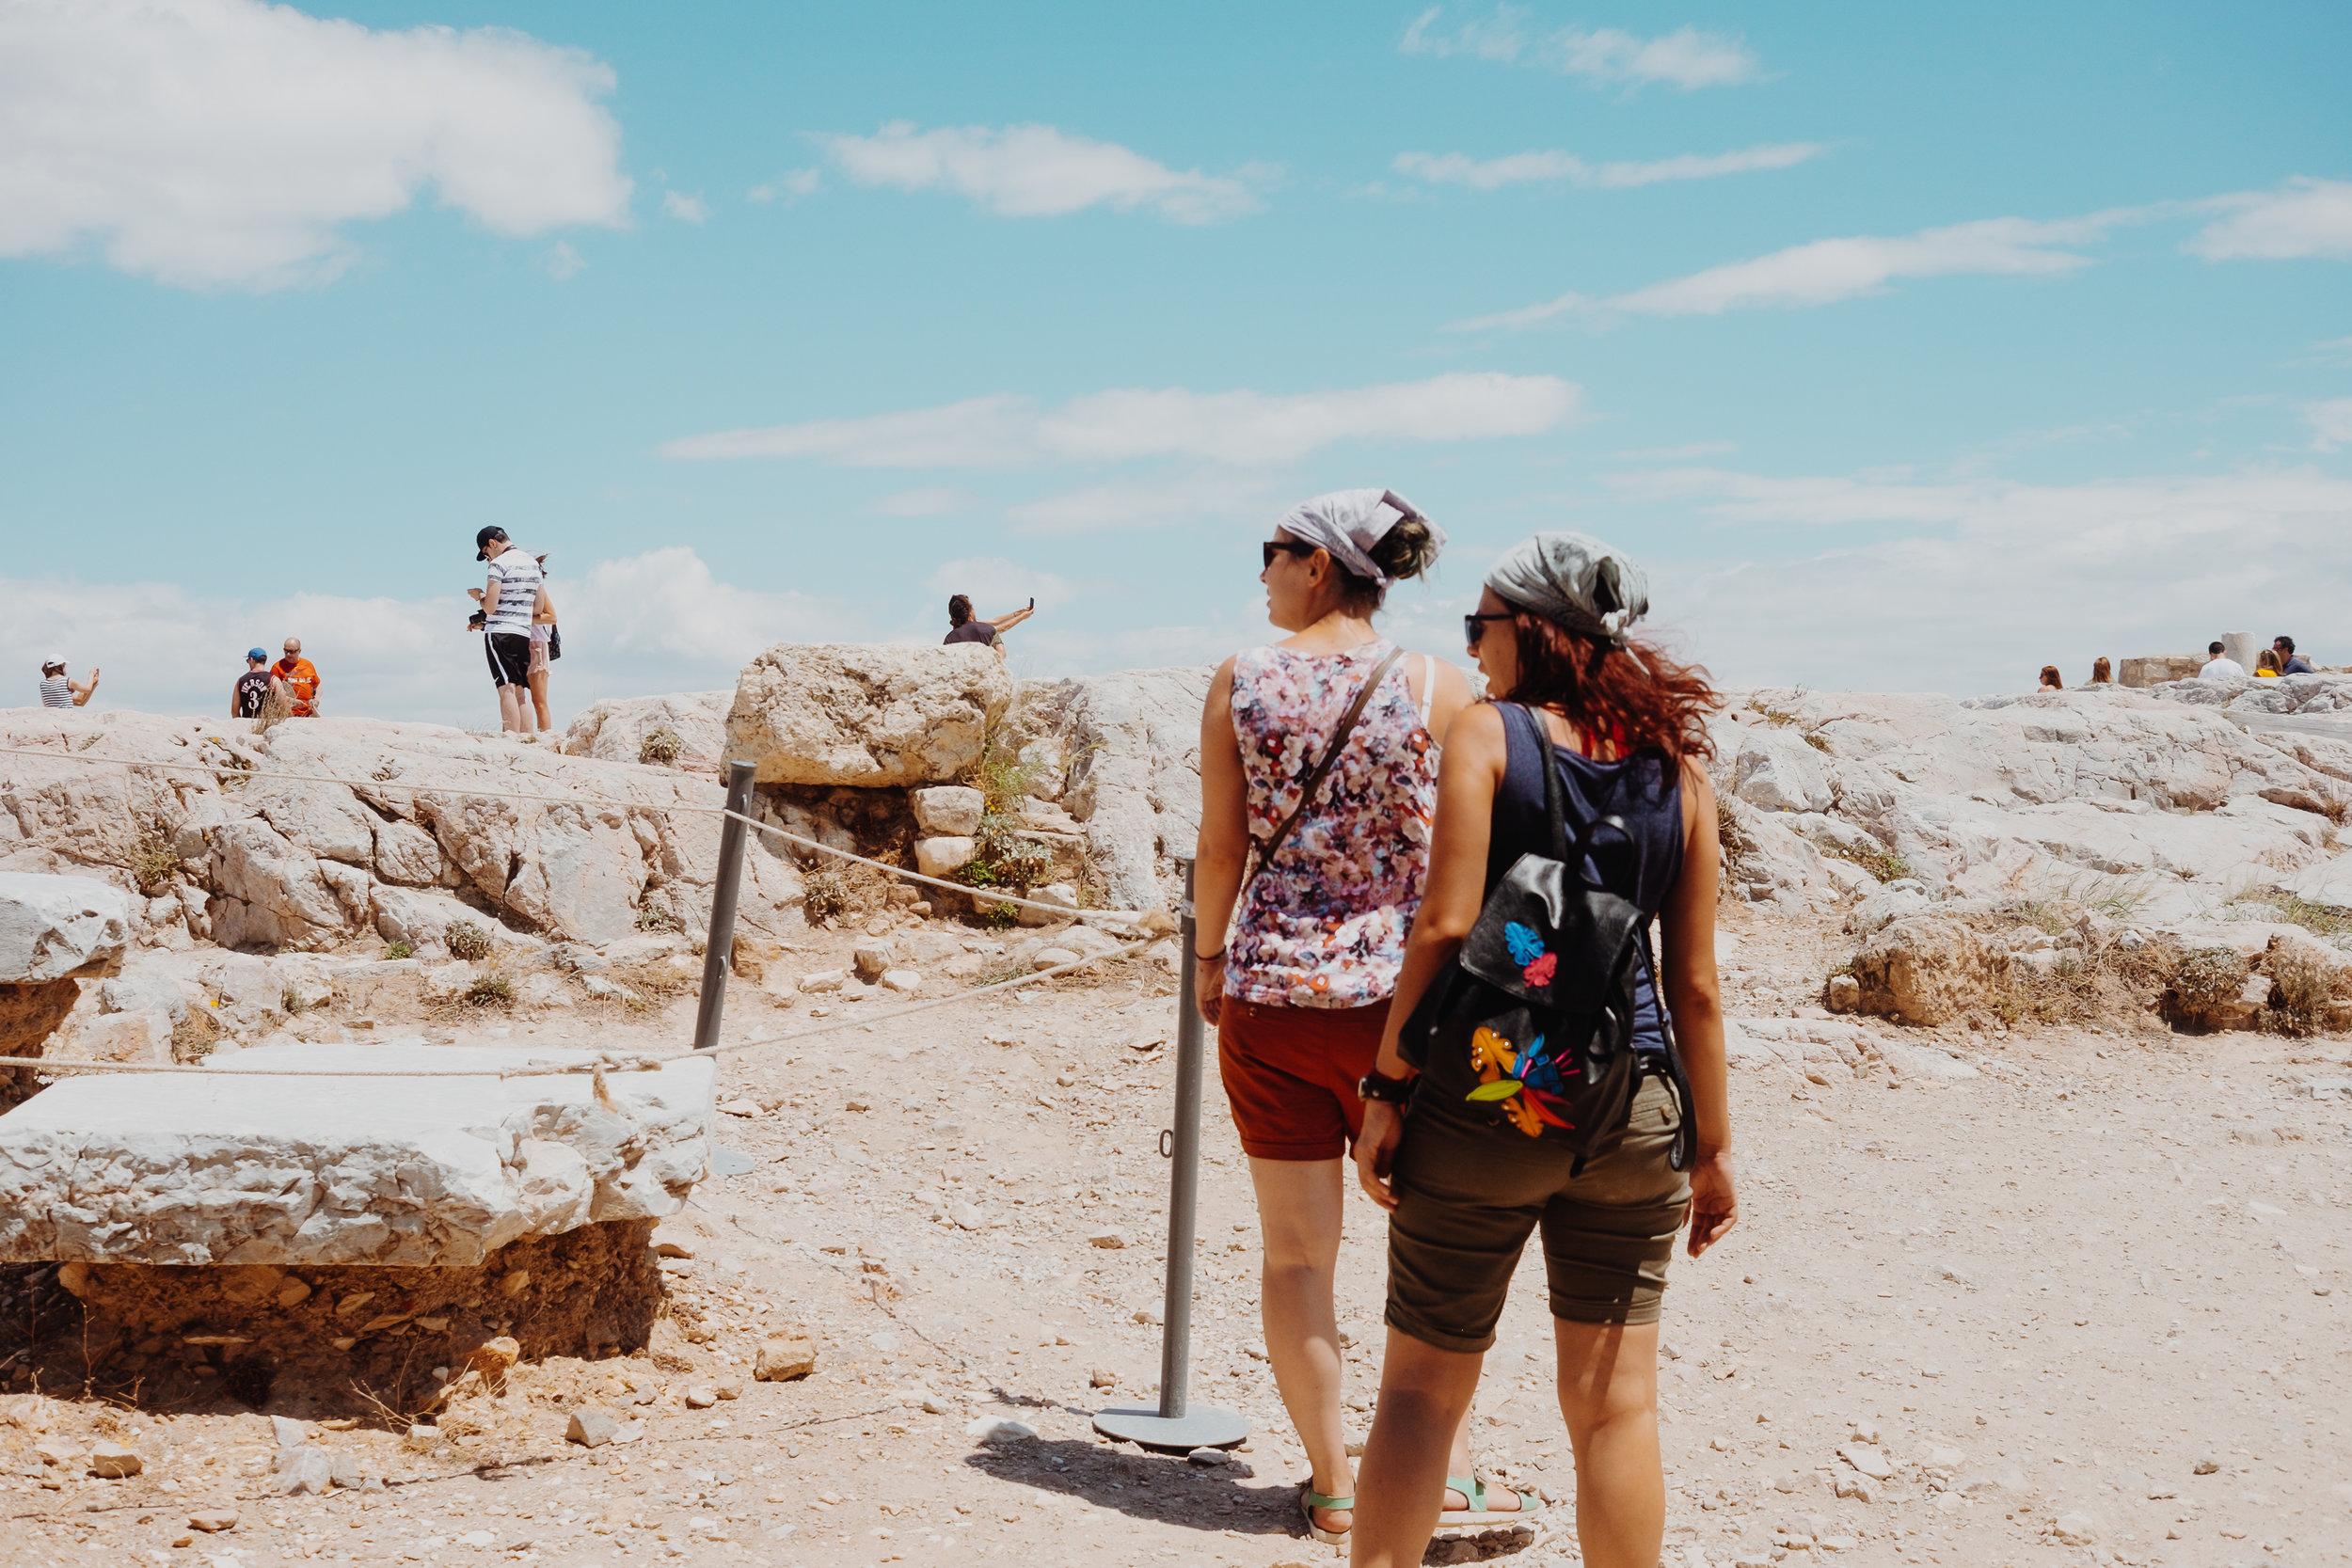 Acropolis tourists